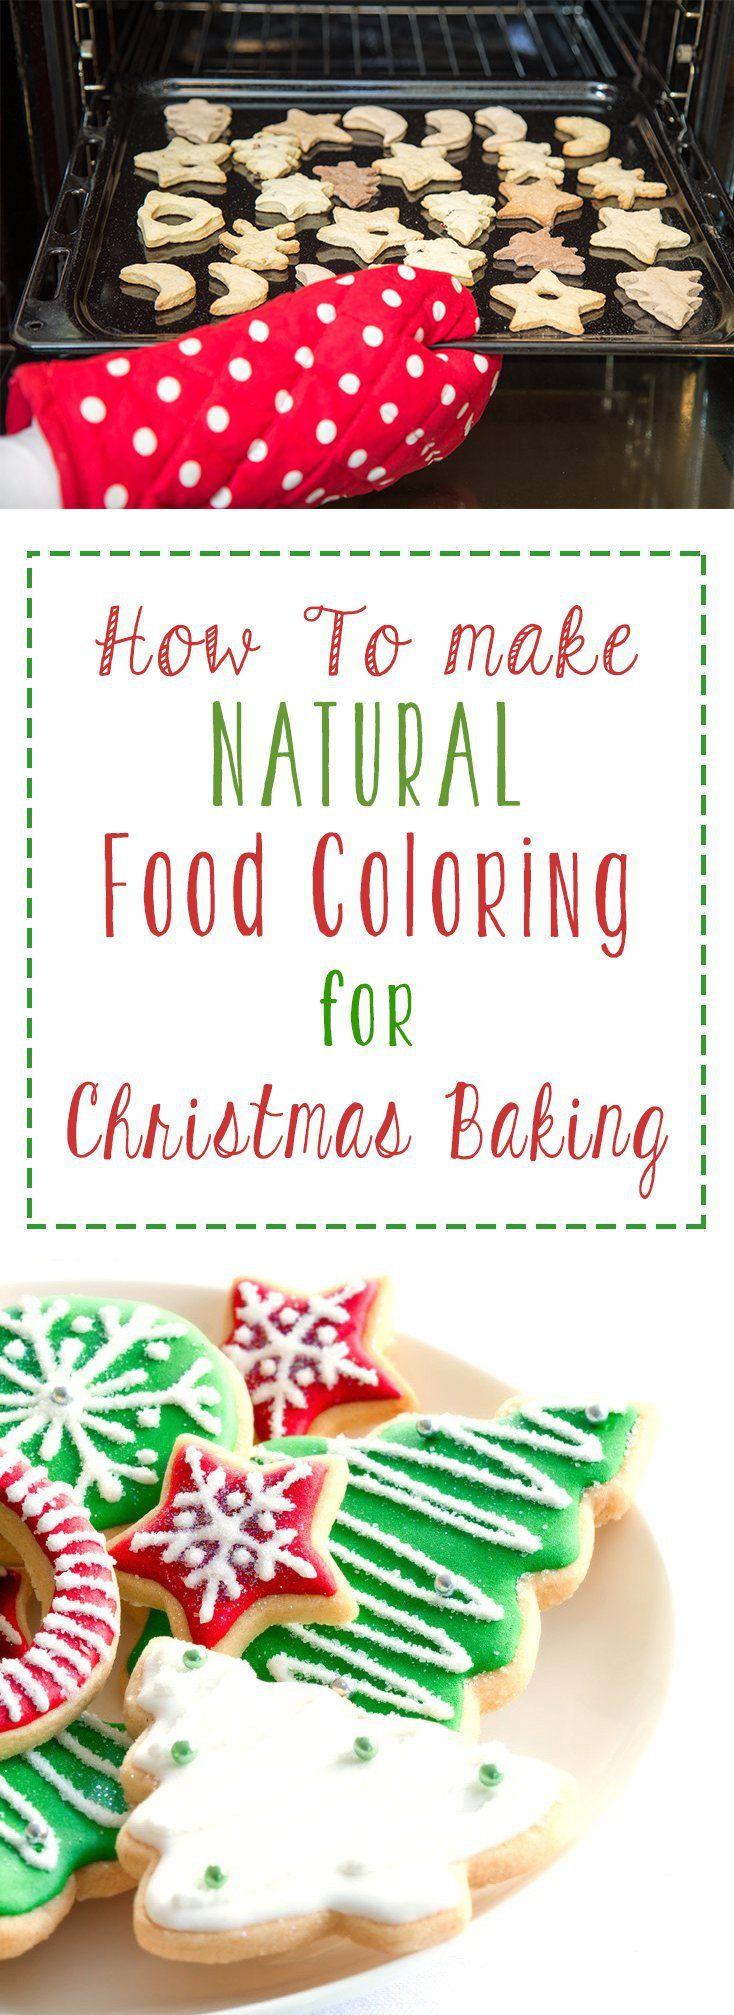 14 best natural food coloring images on Pinterest | Kitchens ...